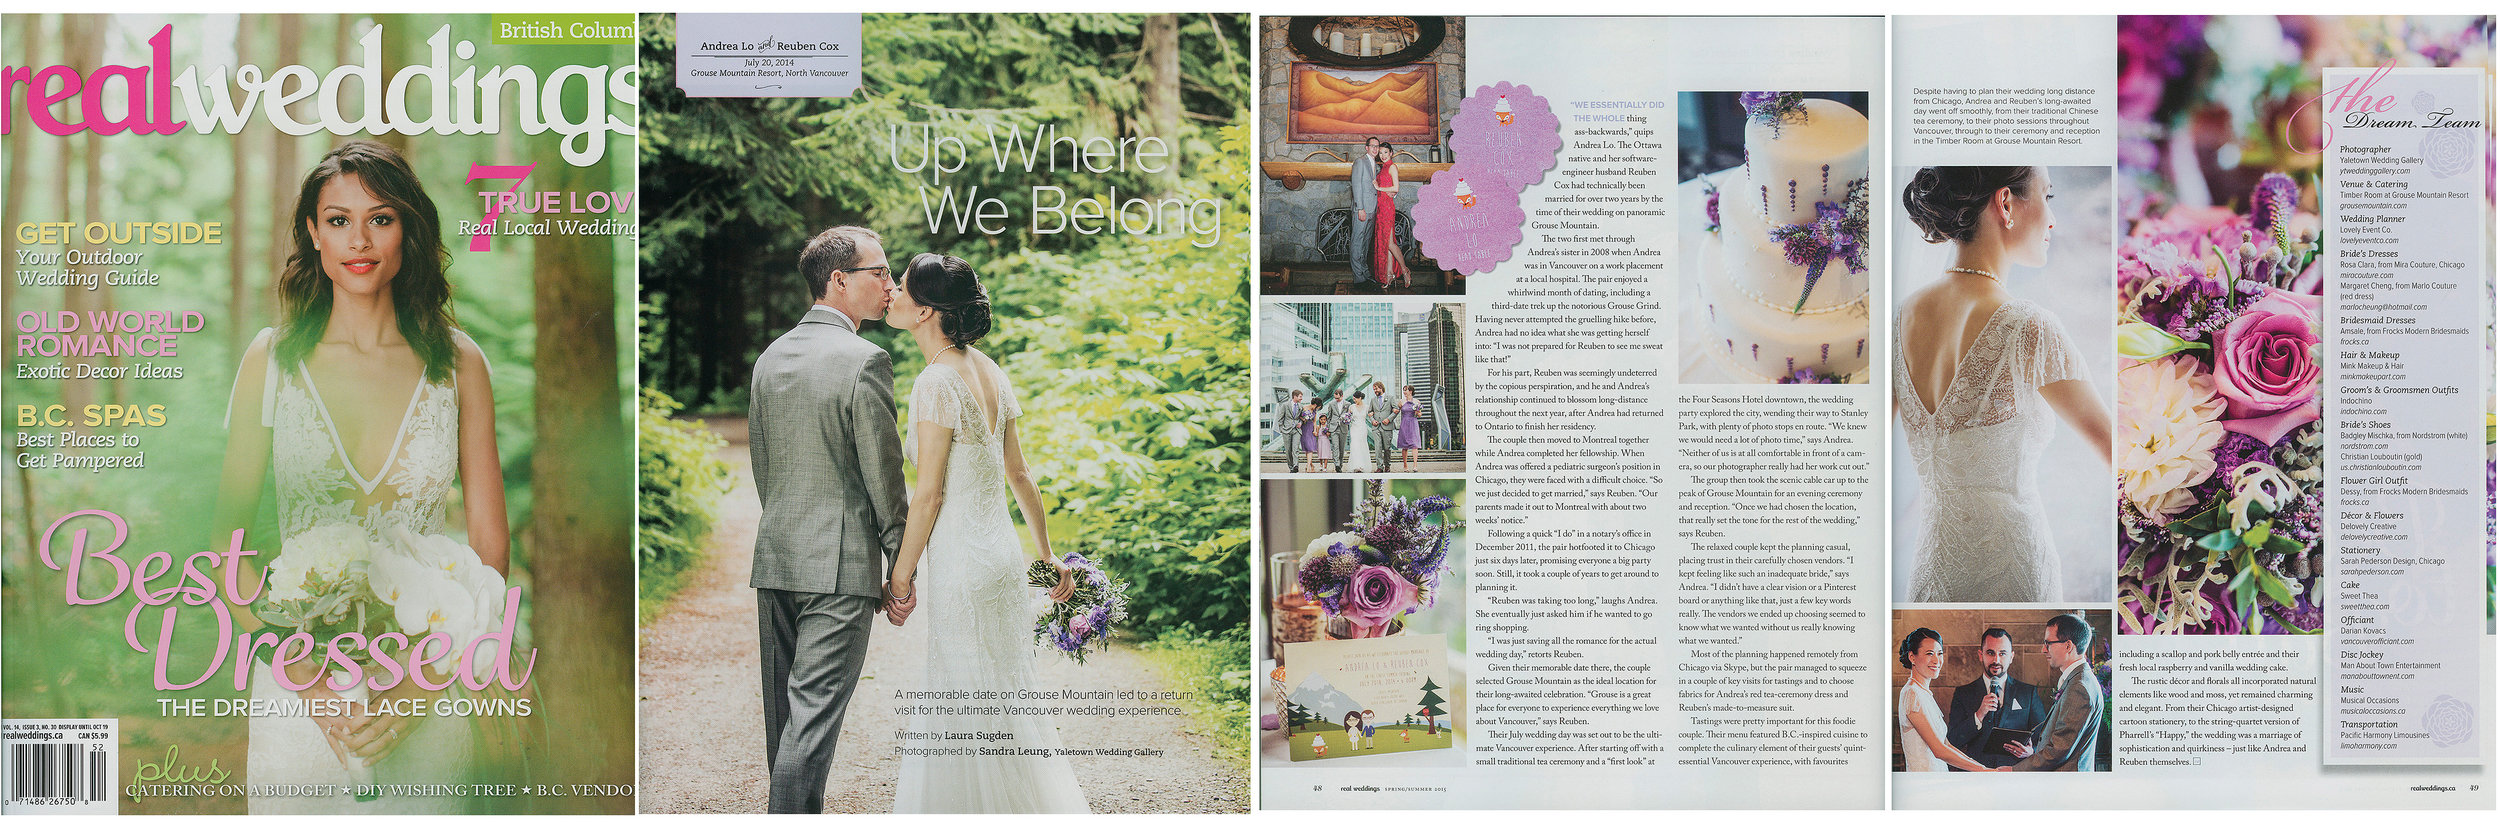 Andrea-Reuben-Grouse-Mountain-Wedding-Real-Weddings-Feature-Yaletown-Photography-001.jpg